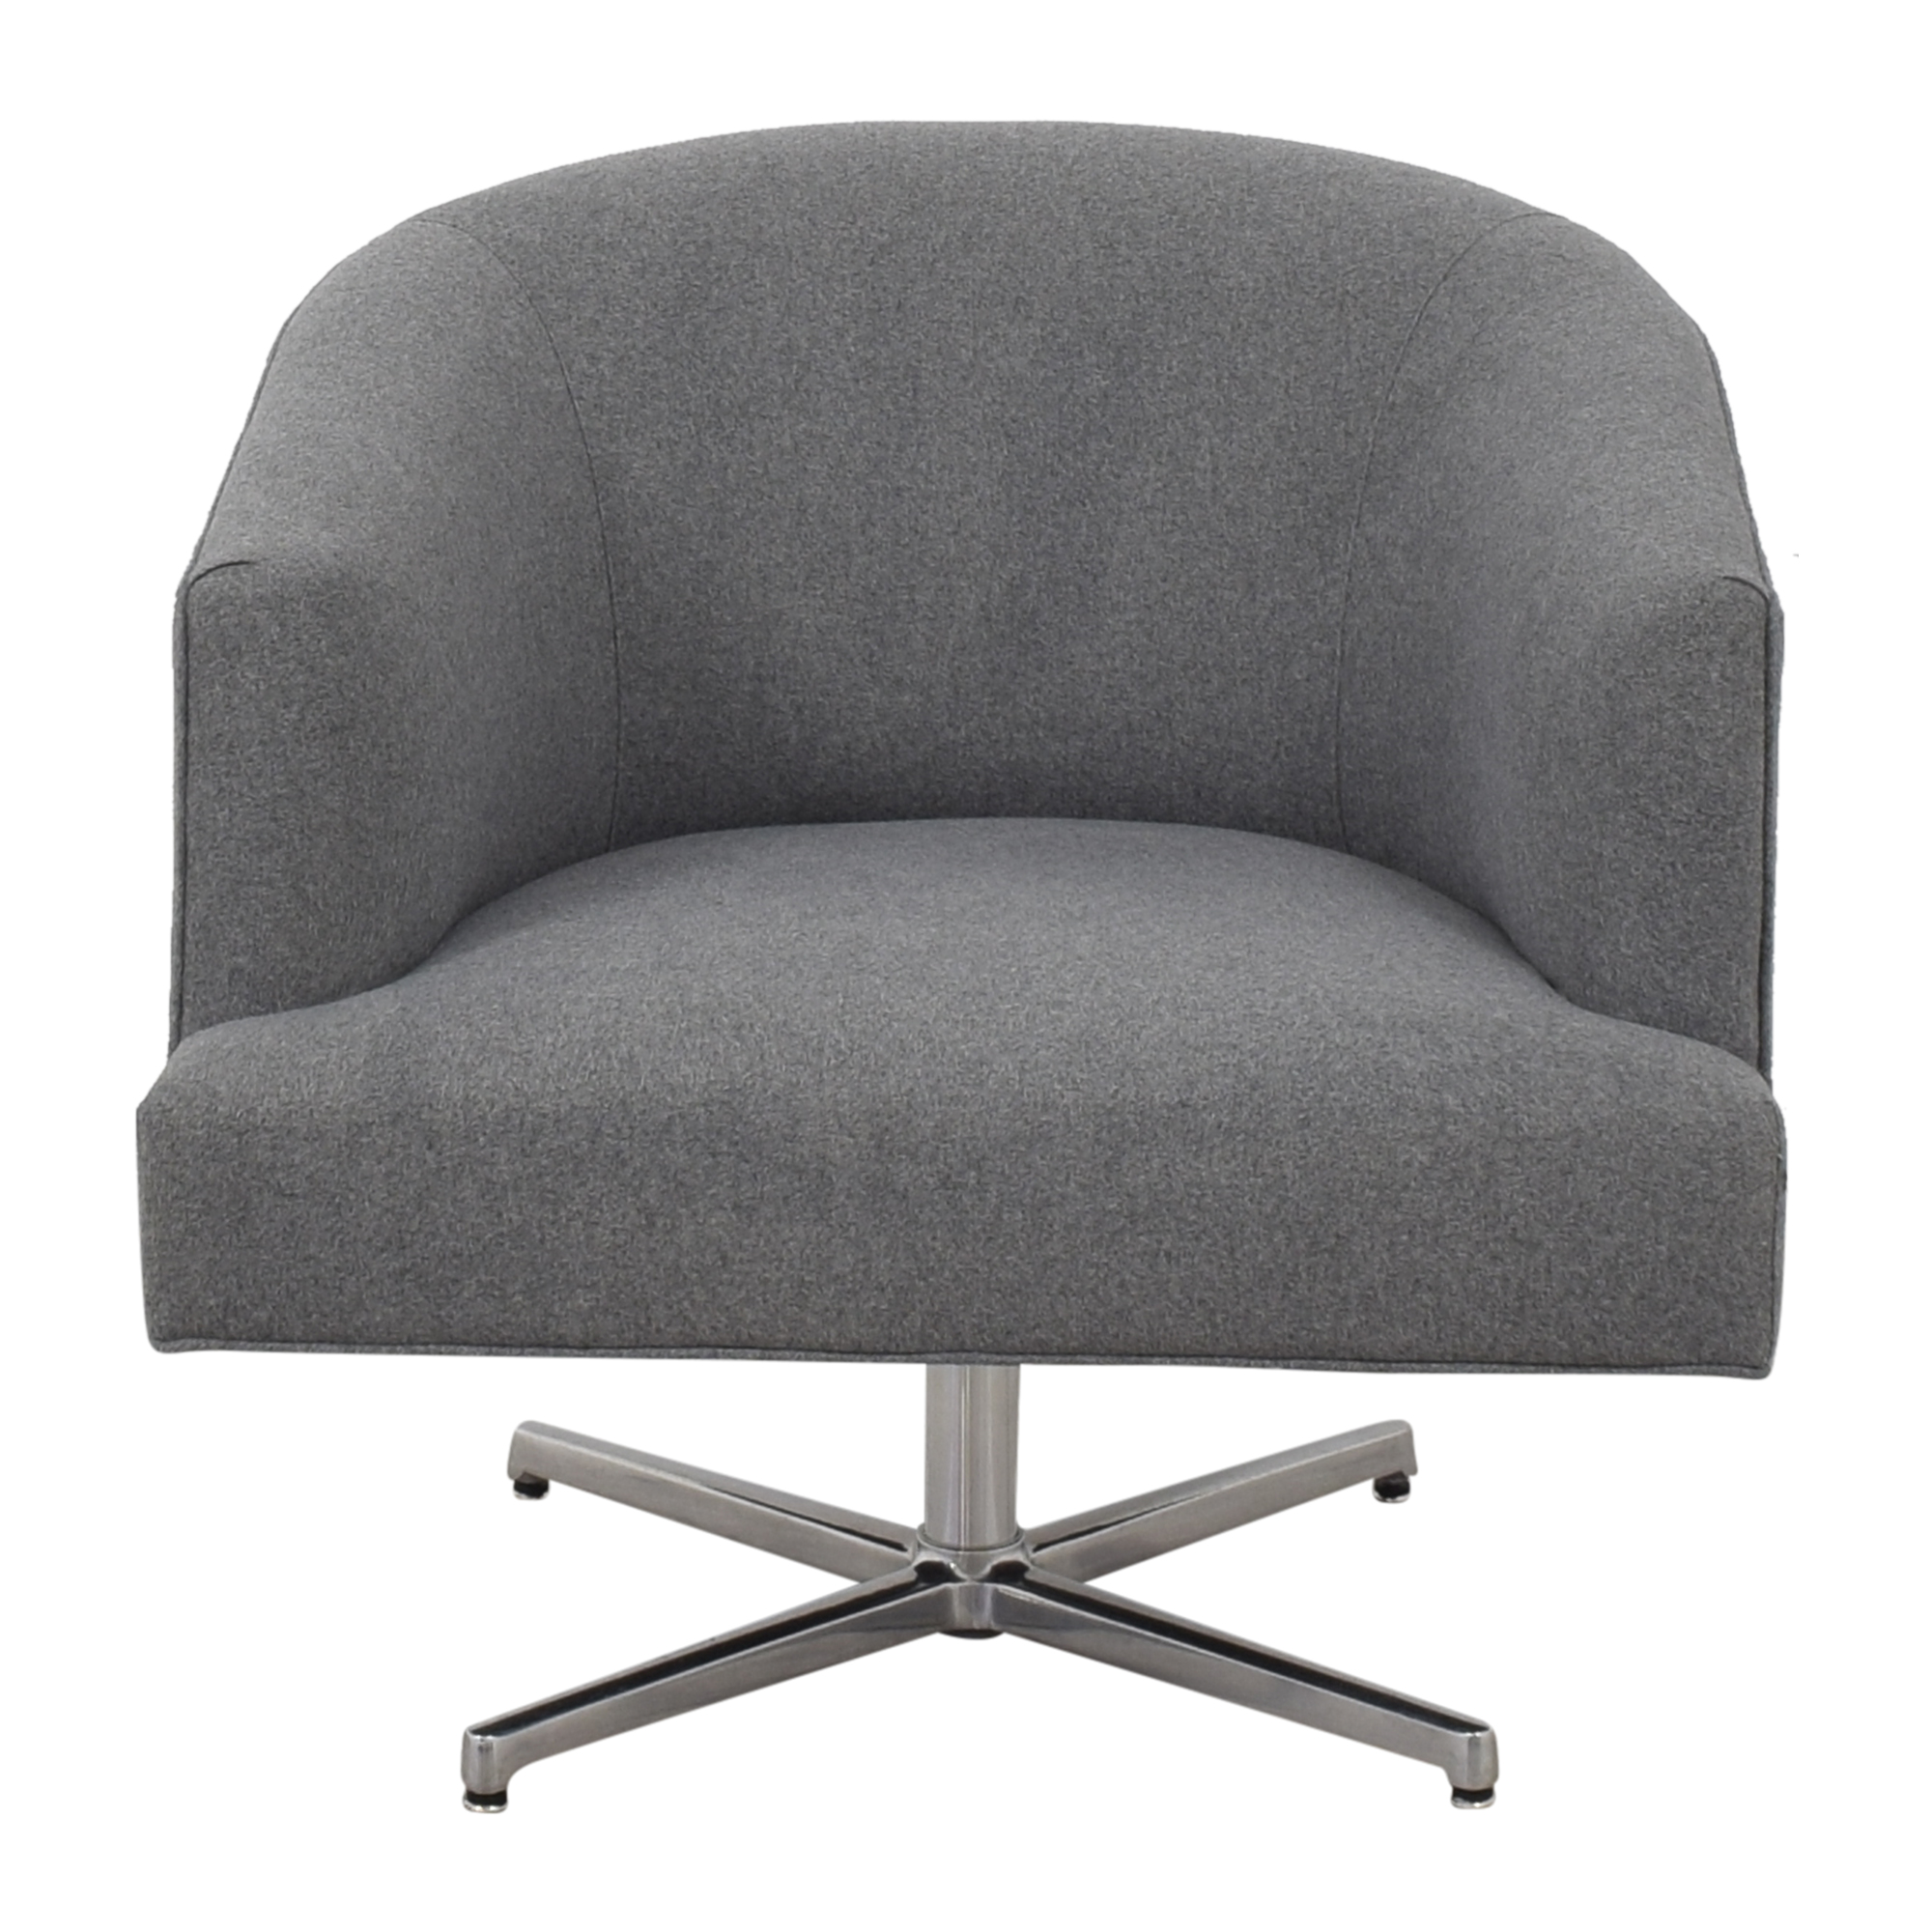 ABC Carpet & Home ABC Carpet & Home Fremont Swivel Chair Accent Chairs